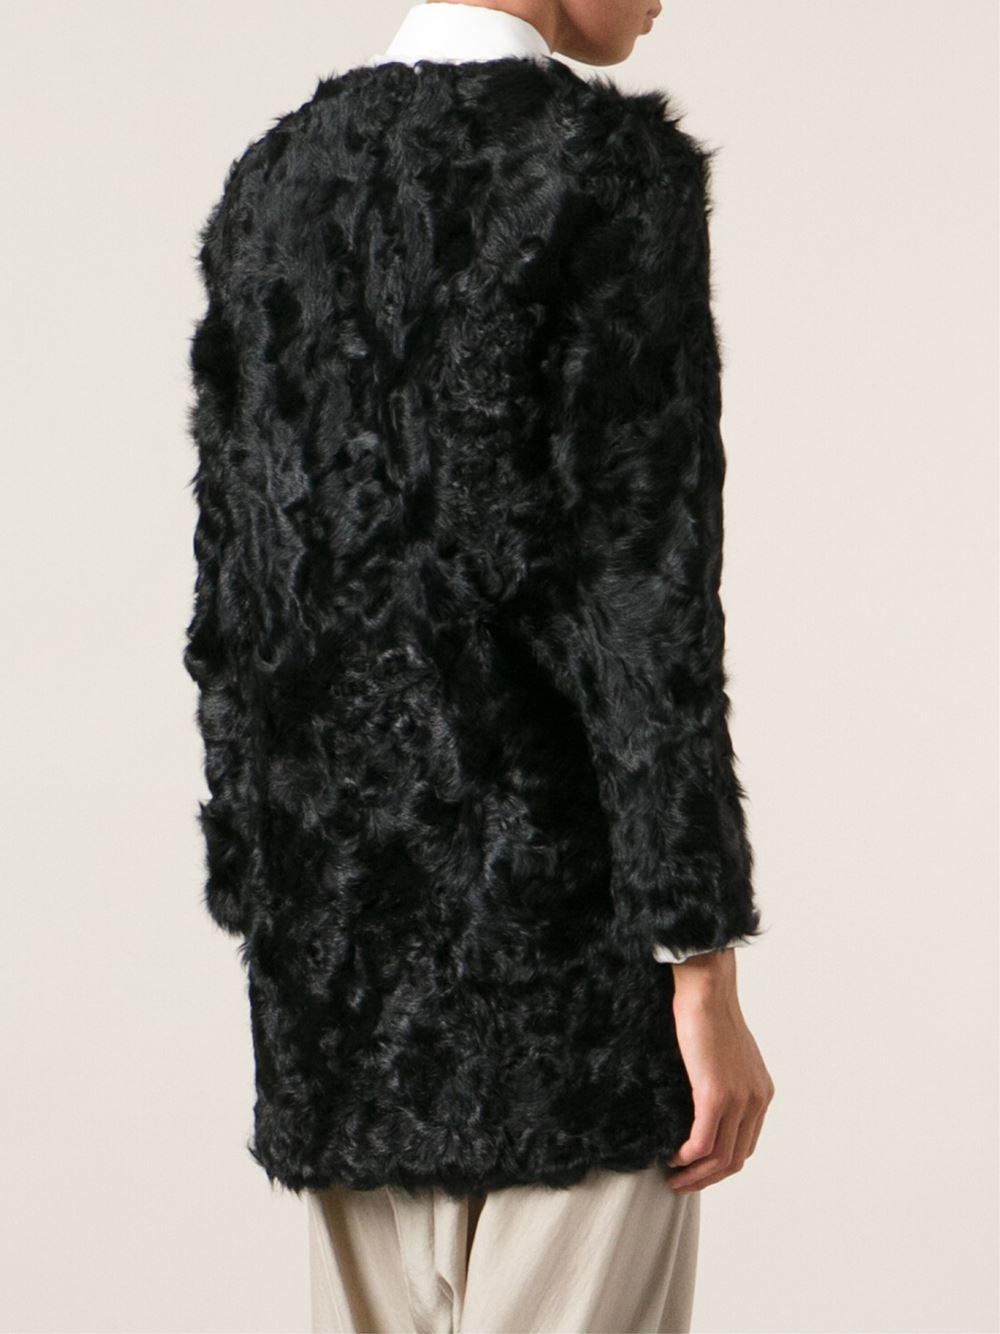 Ravn Curly Lamb Fur Coat in Black | Lyst